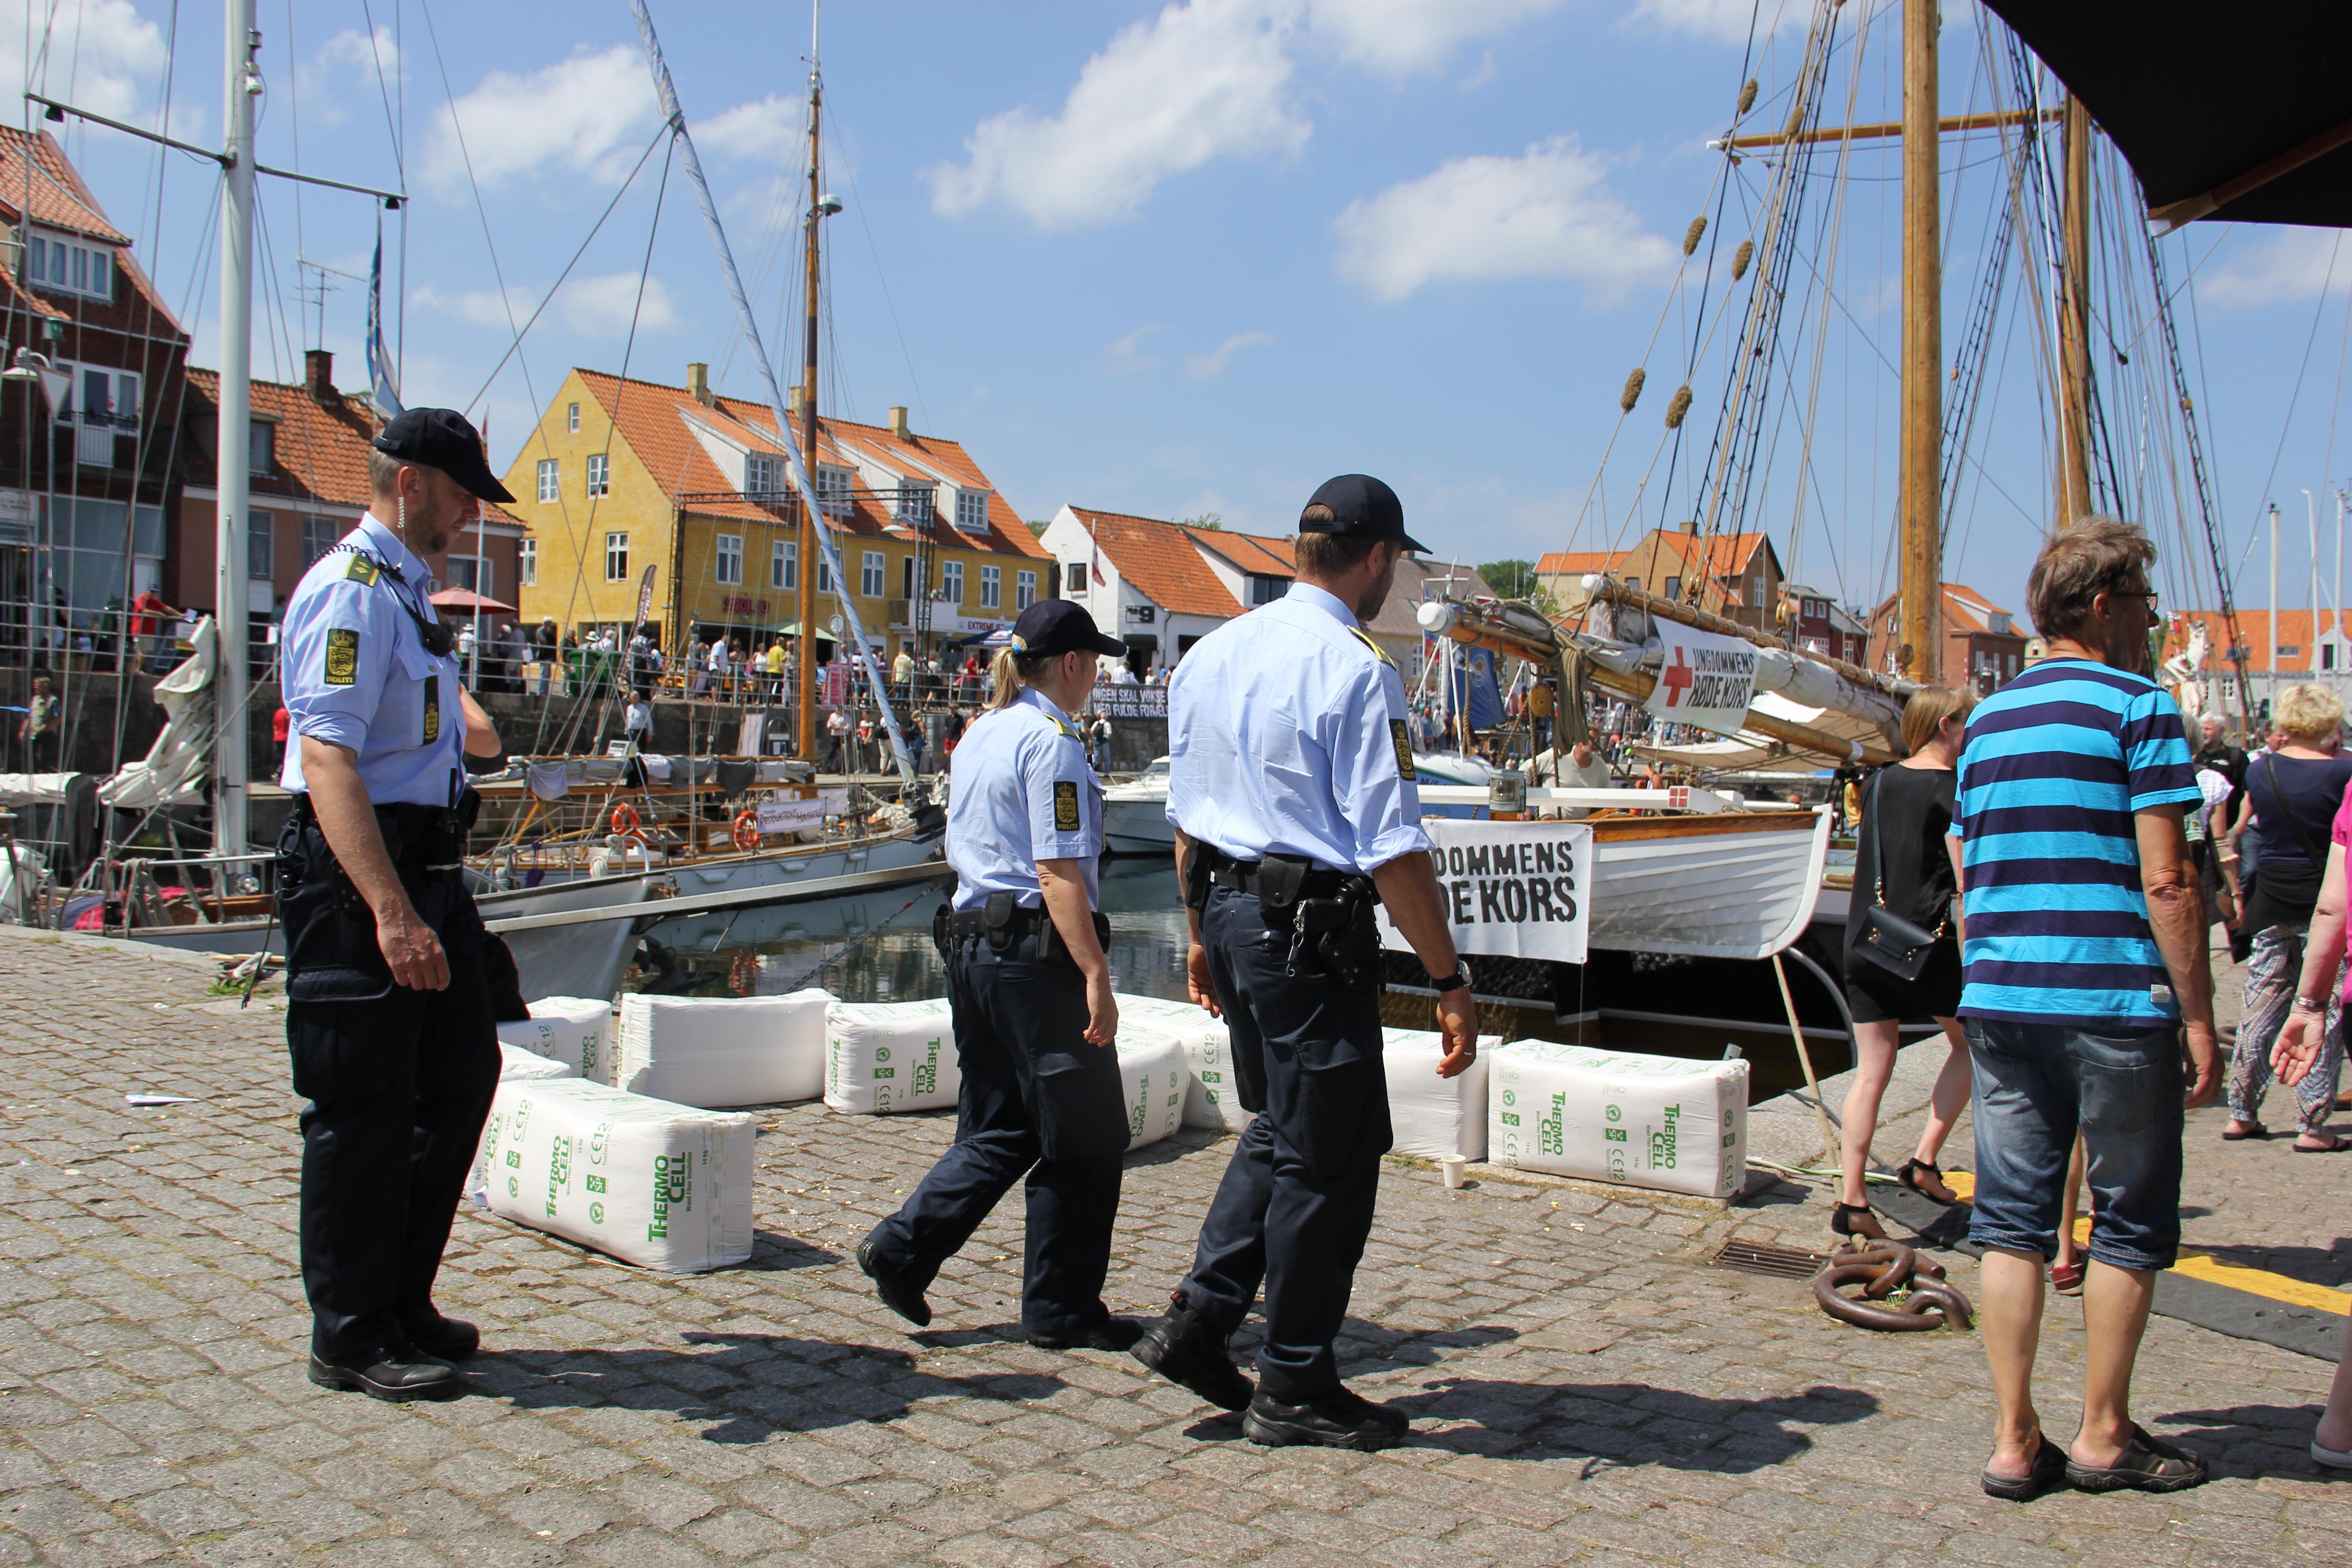 Bornholms Politi, Folkemøde